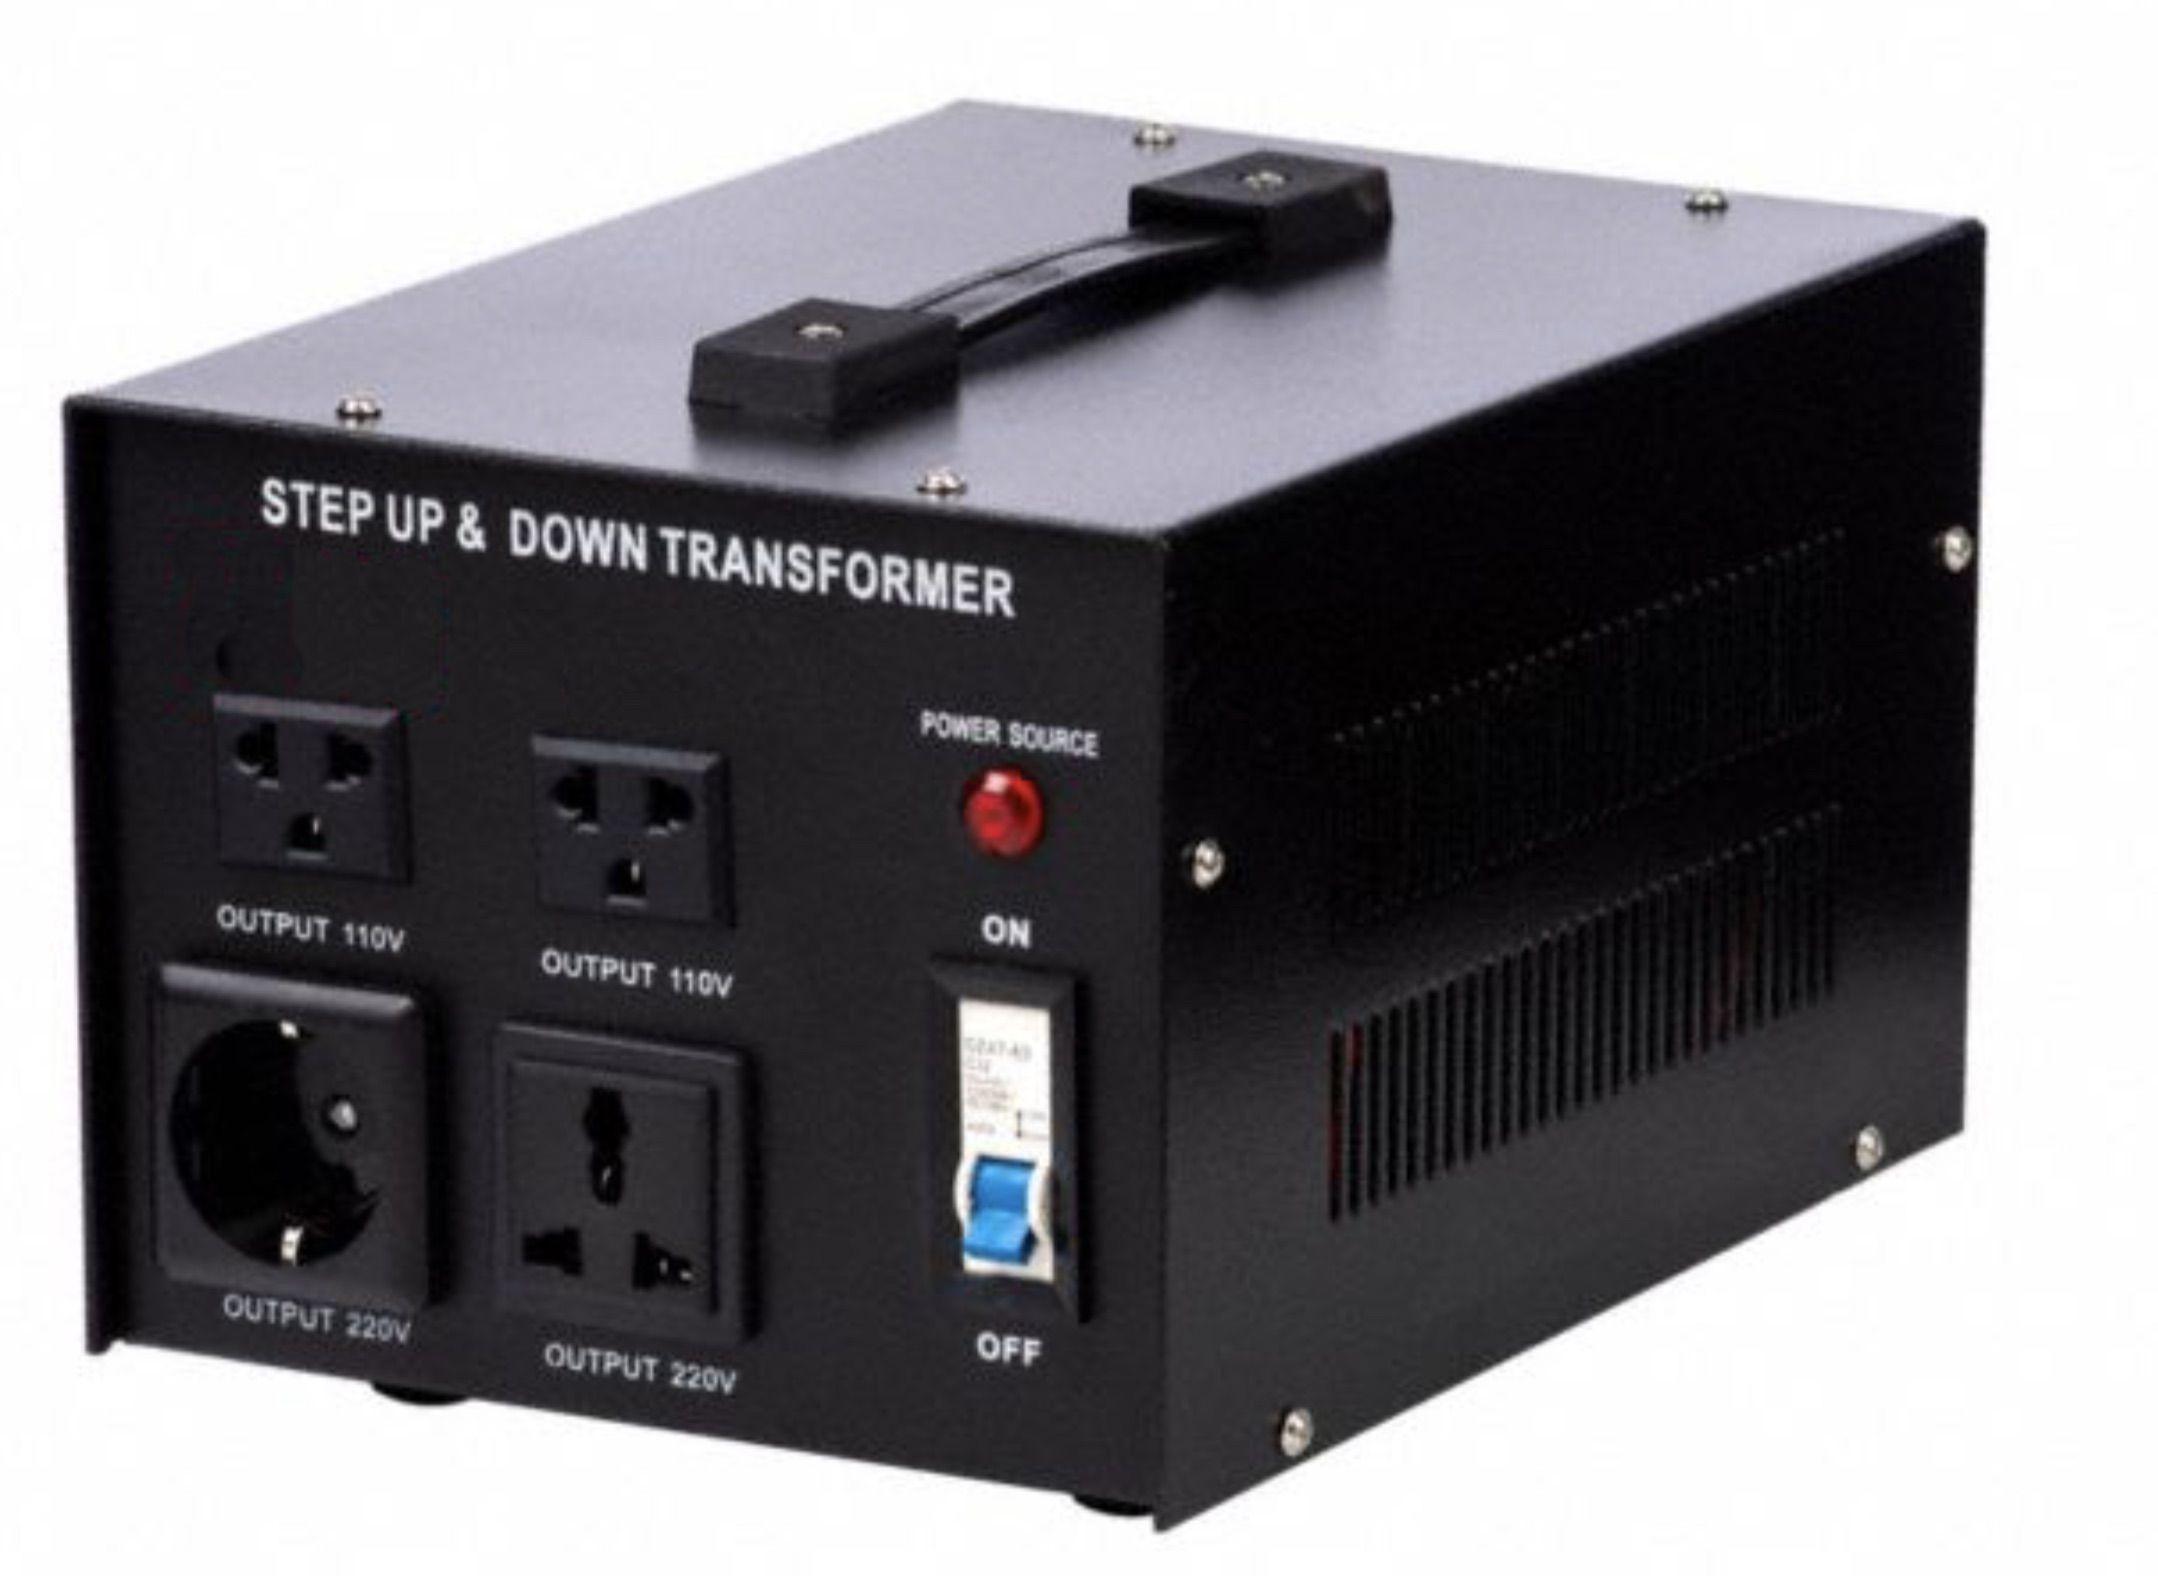 3000VA升壓降壓110V-220V to 220V-110V穩壓轉換器昇級版